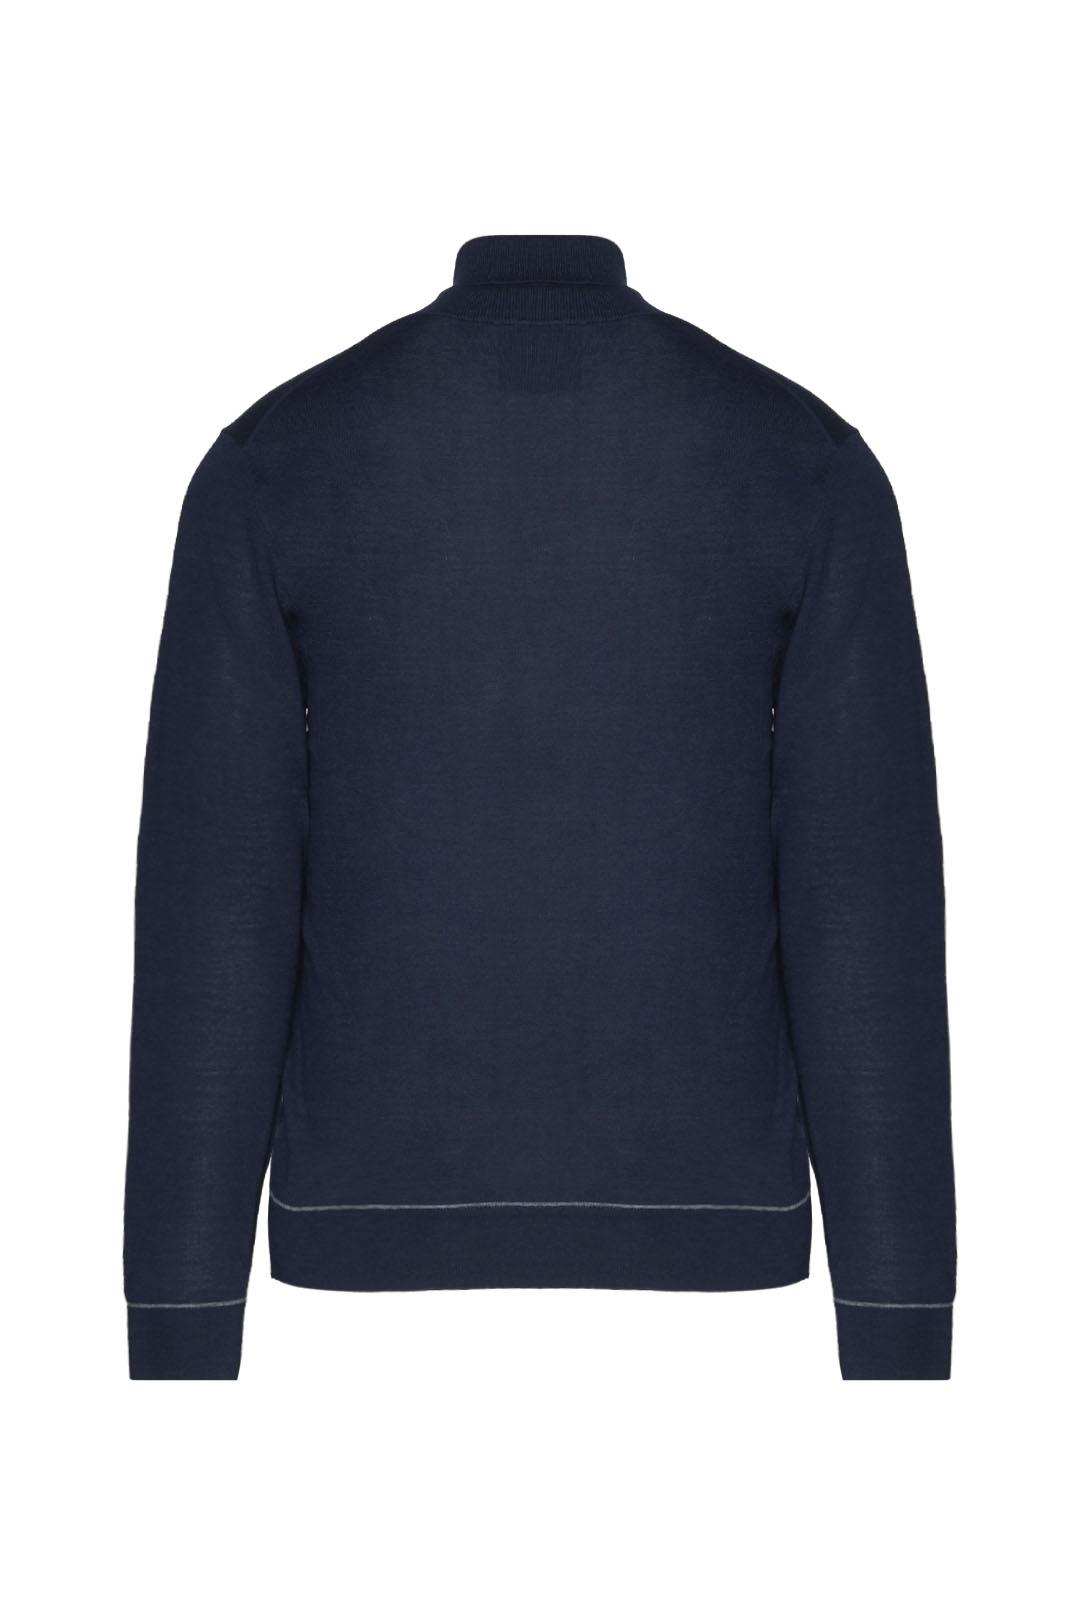 Merino wool blend turtleneck sweater     2